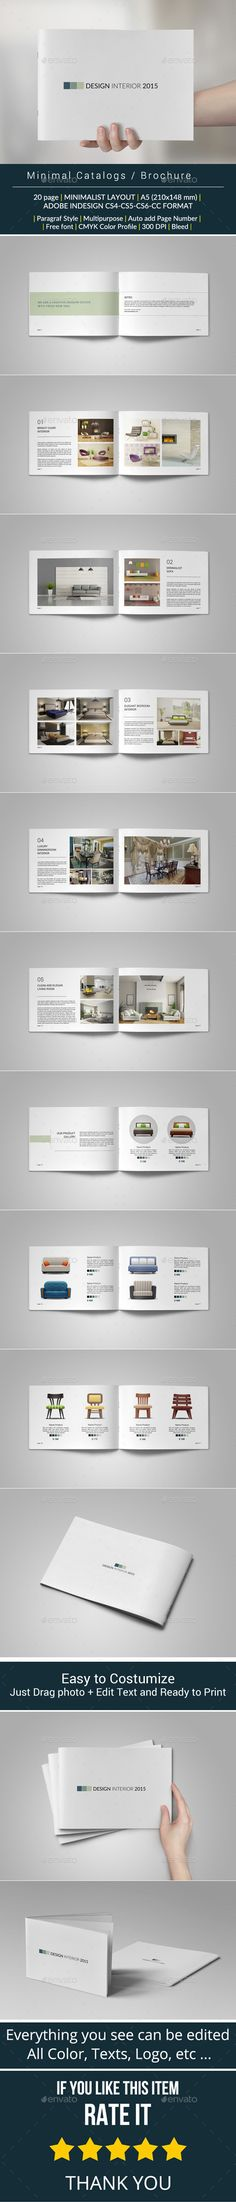 19 Best Brochures Images On Pinterest Page Layout Brochure